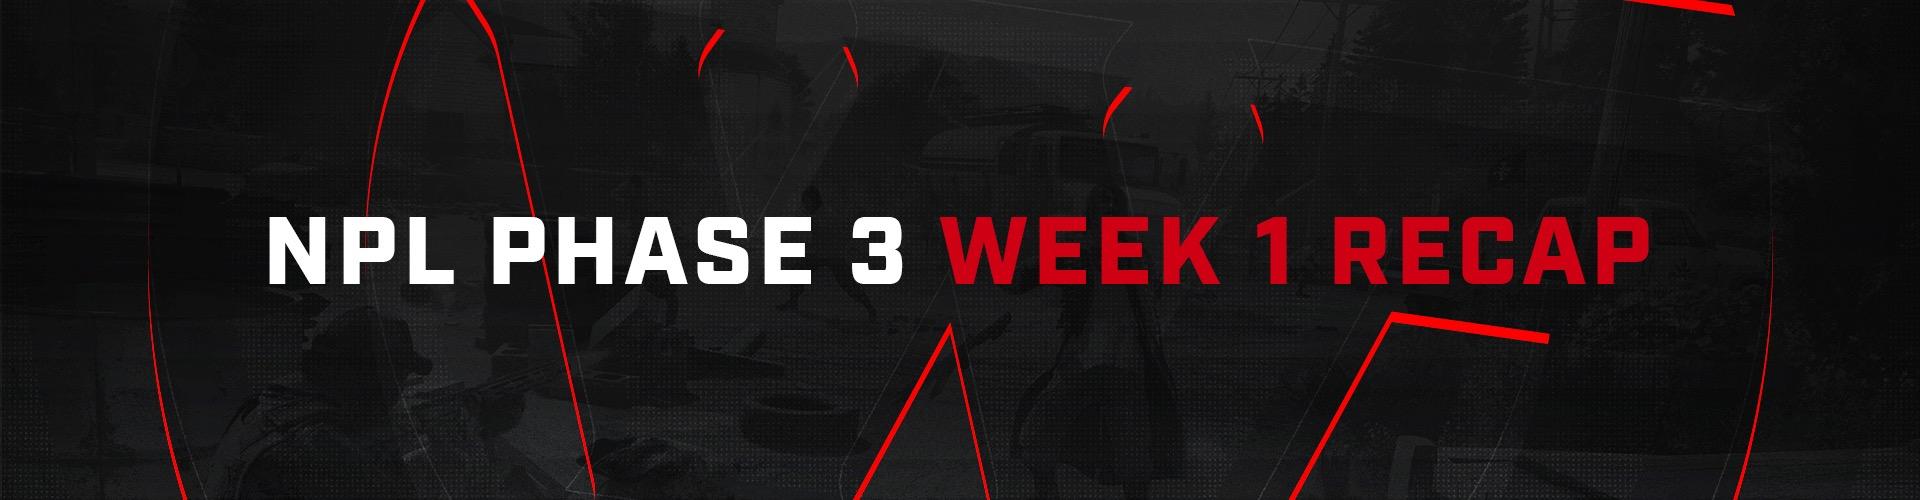 NPL Phase 3 Week 1 Recap